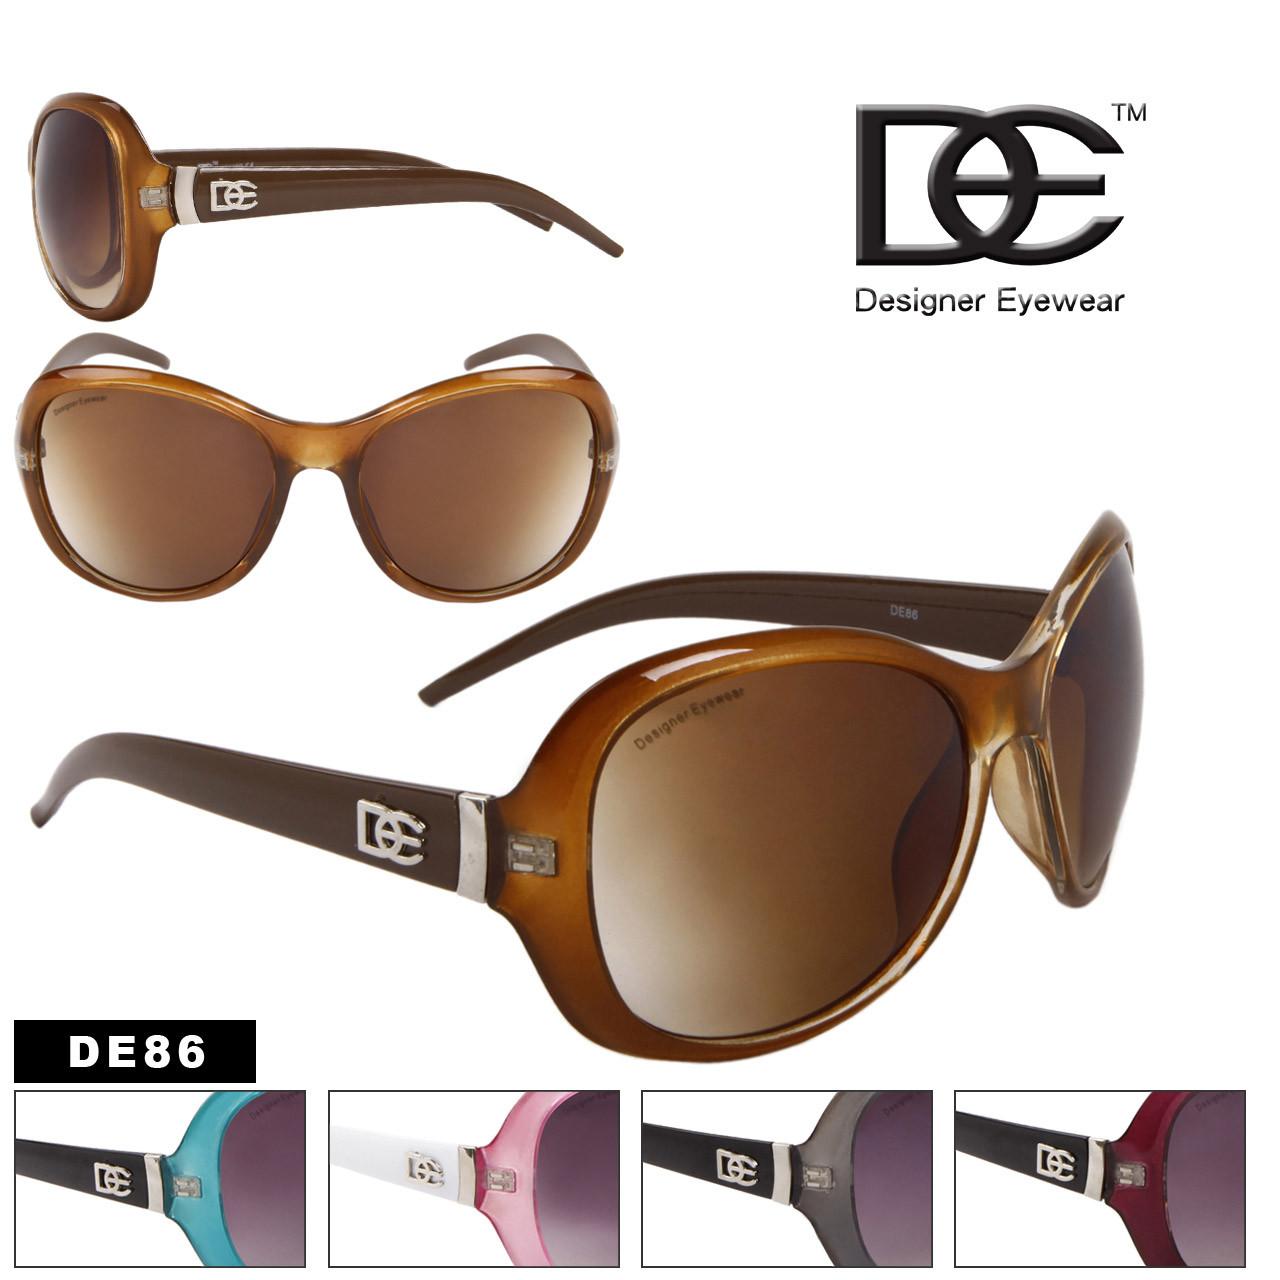 Designer Eyewear DE86 Wholesale Sunglasses